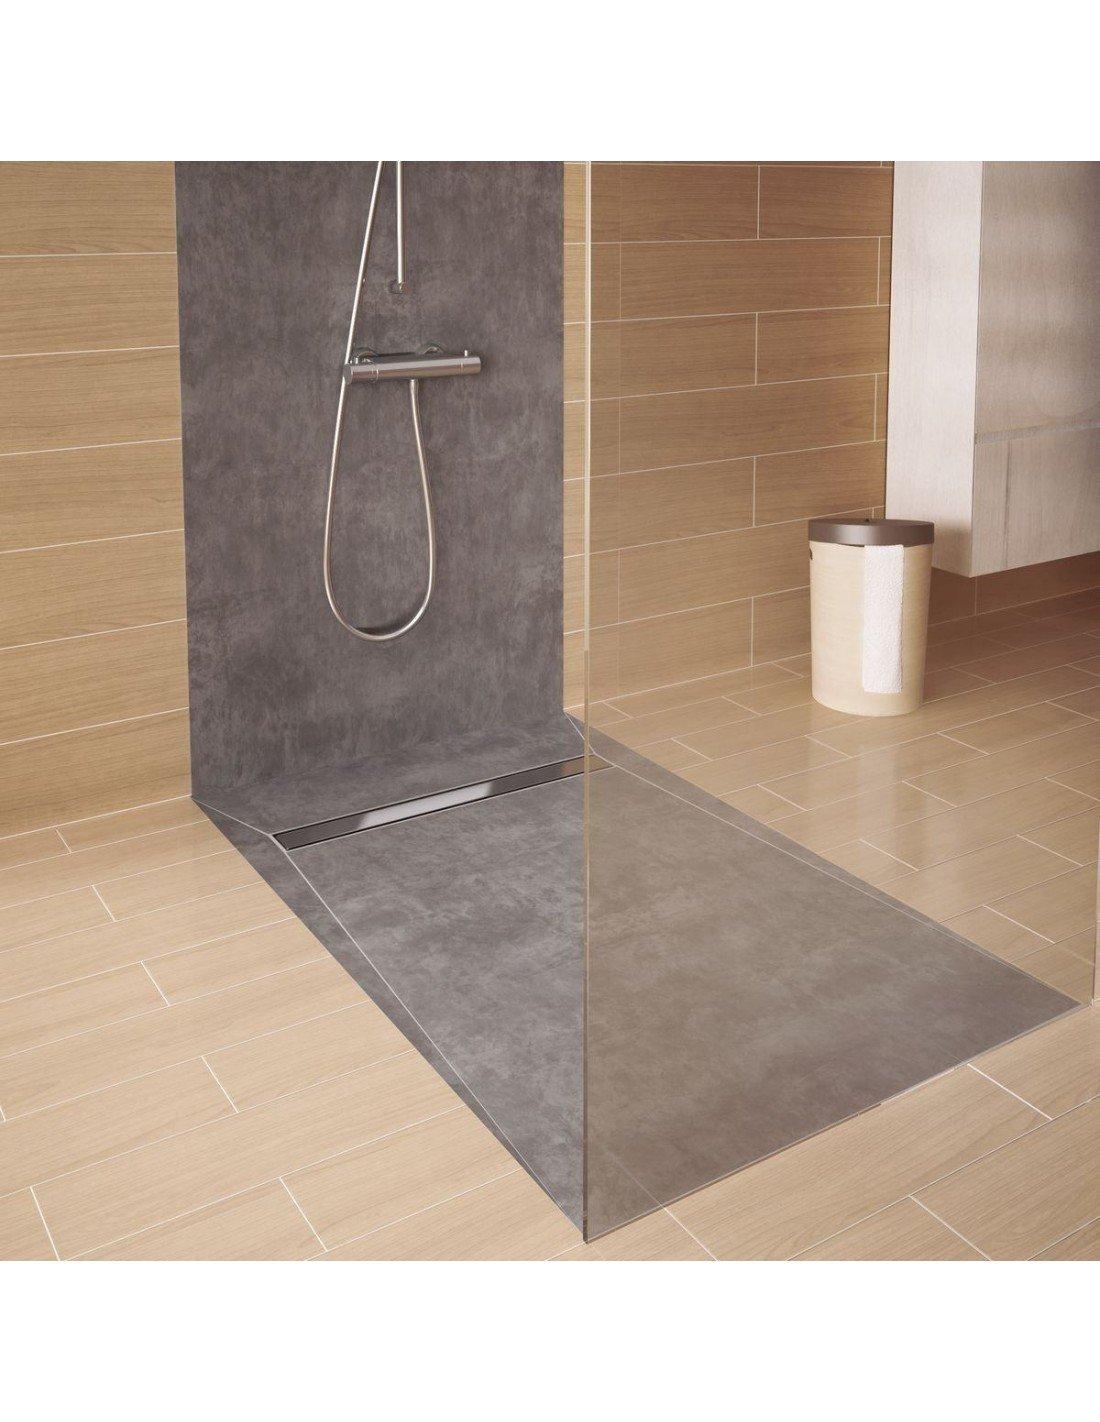 wiper classic 600 mm zonda cover stainless steel linear shower drain trap set ebay